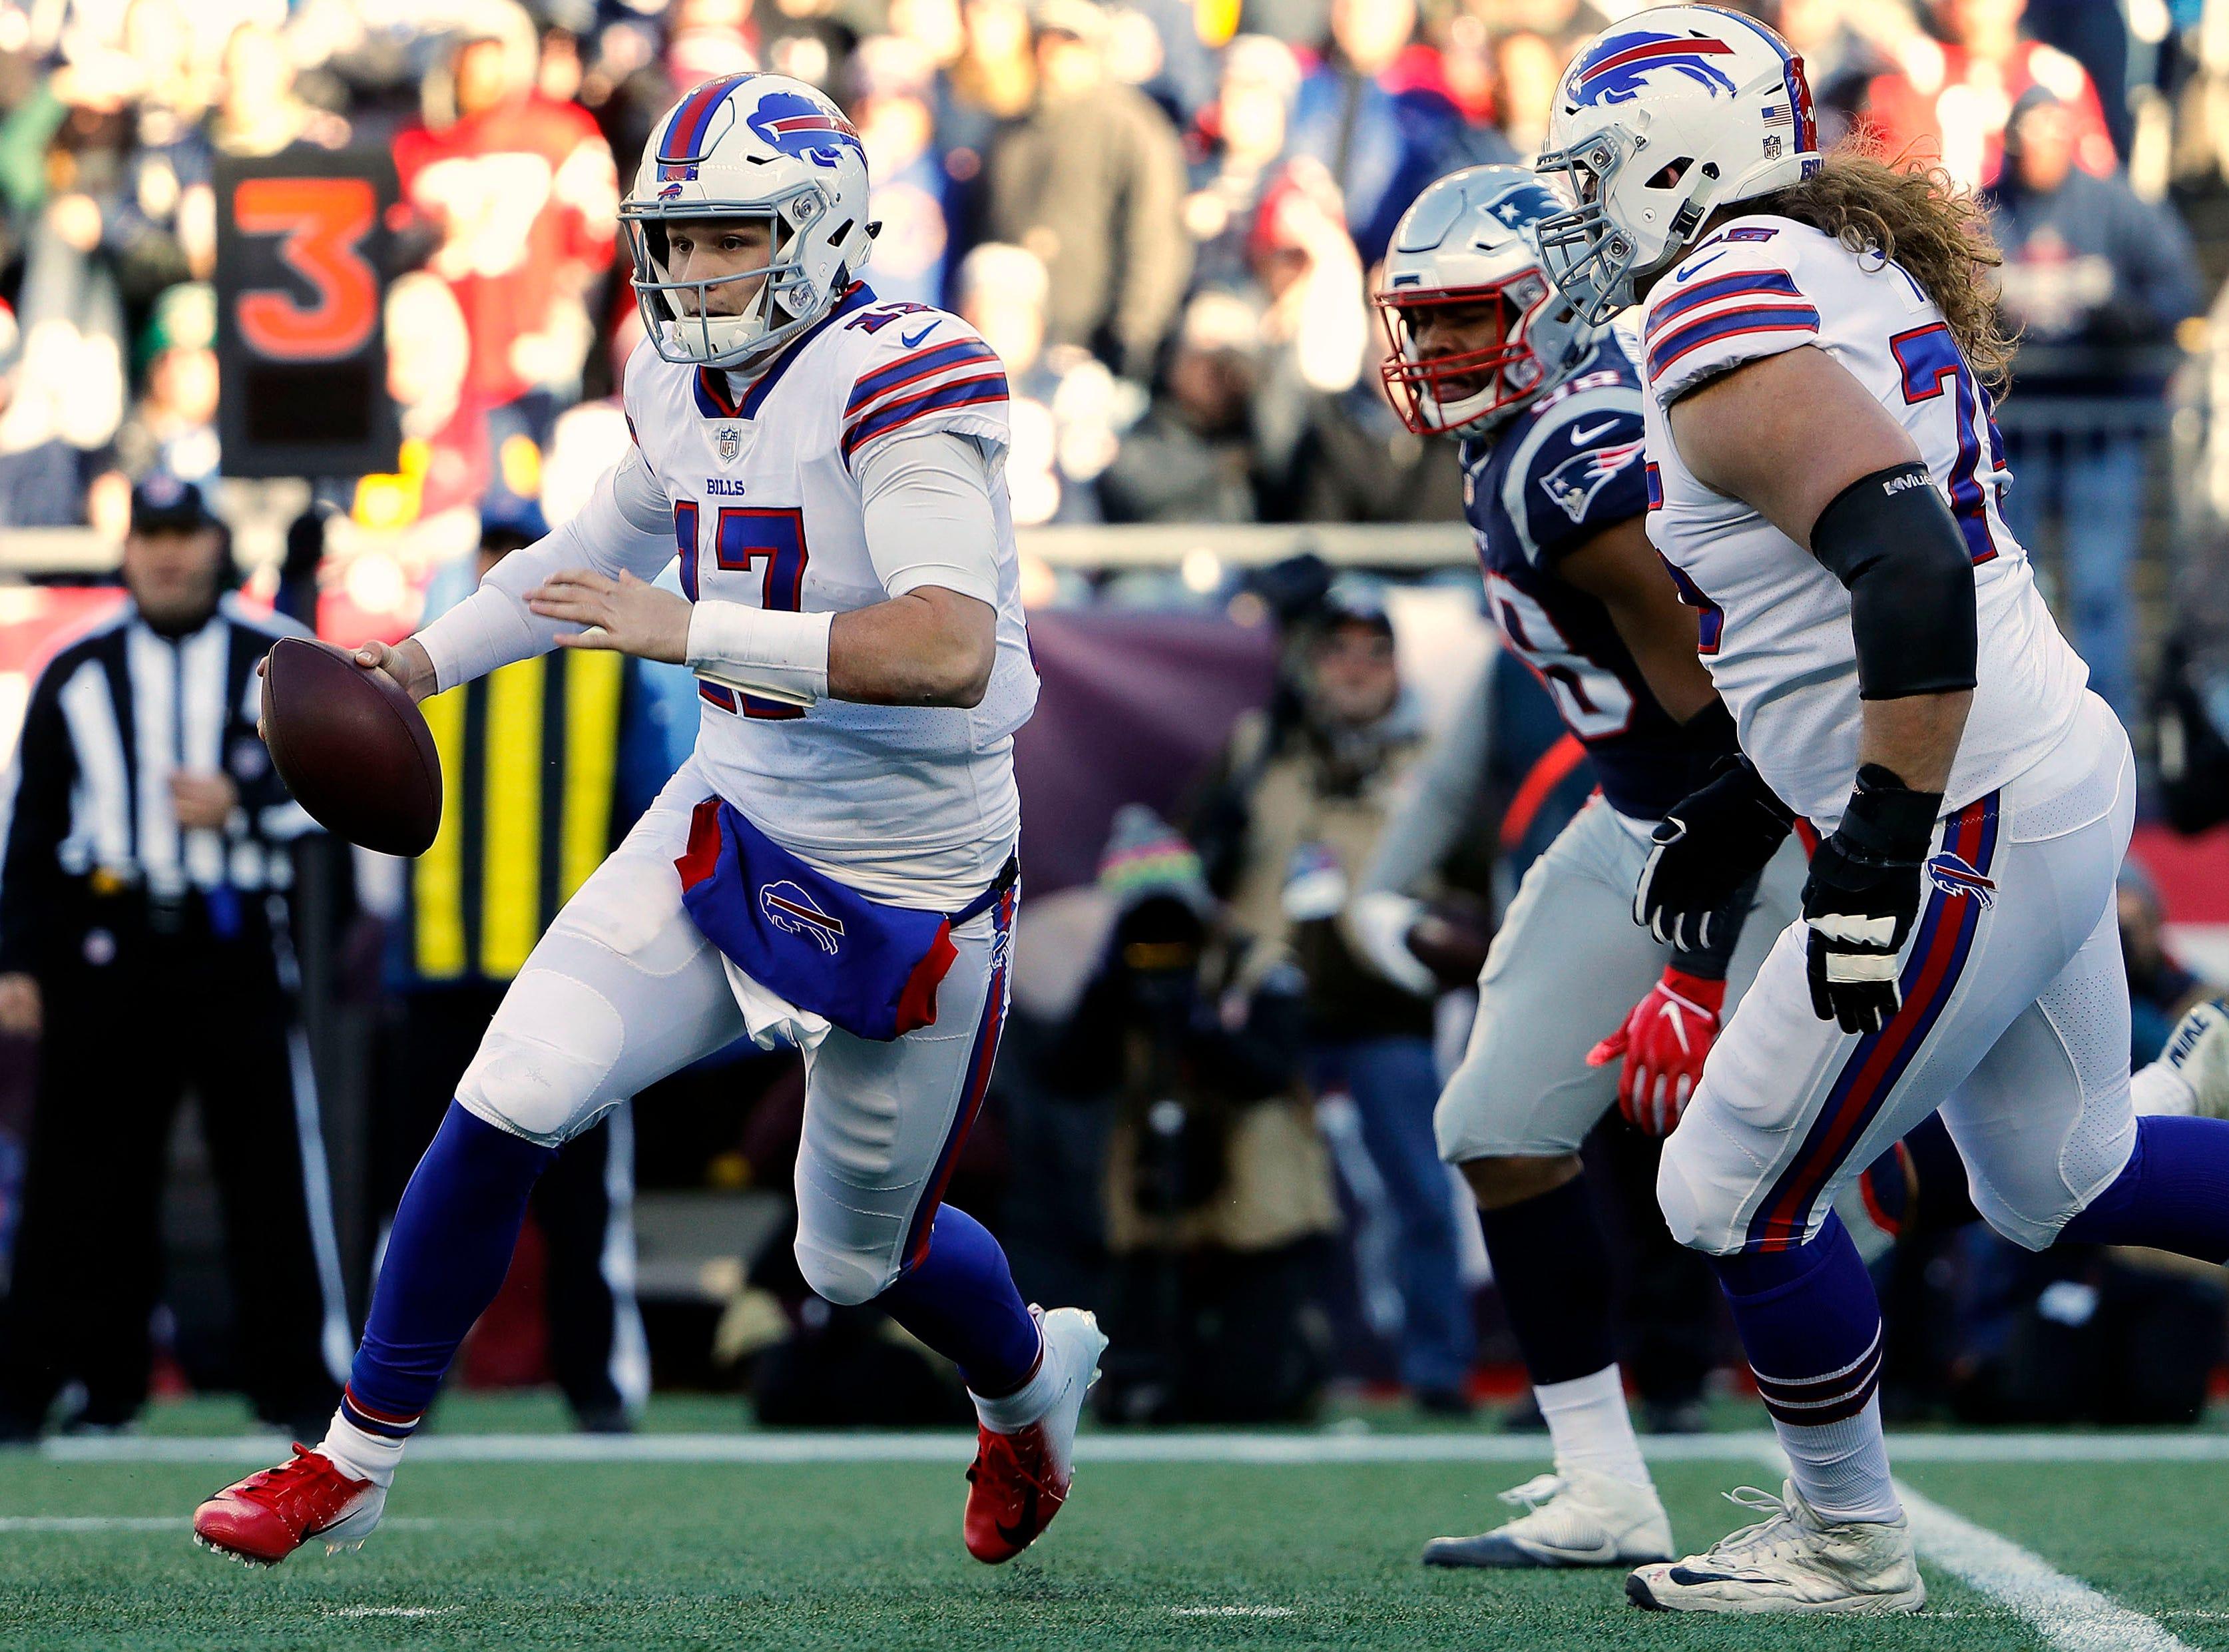 Dec 23, 2018; Foxborough, MA, USA; Buffalo Bills quarterback Josh Allen (17) runs against the New England Patriots during the first quarter at Gillette Stadium. Mandatory Credit: Winslow Townson-USA TODAY Sports